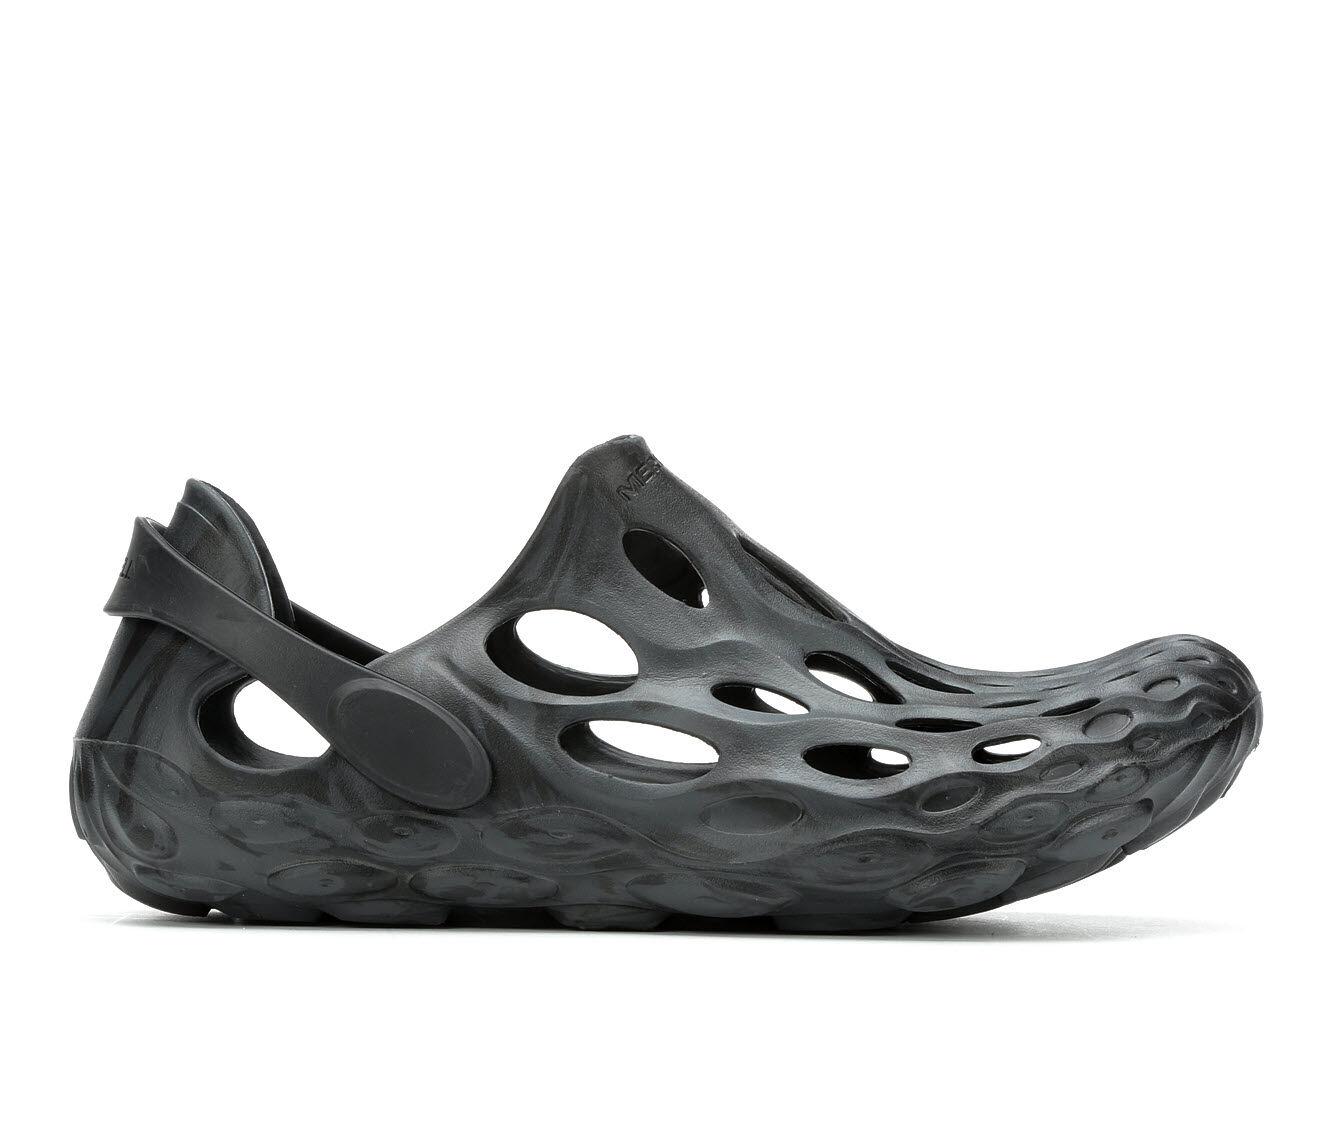 Men's Merrell Hydro Moc Outdoor Sandals Black